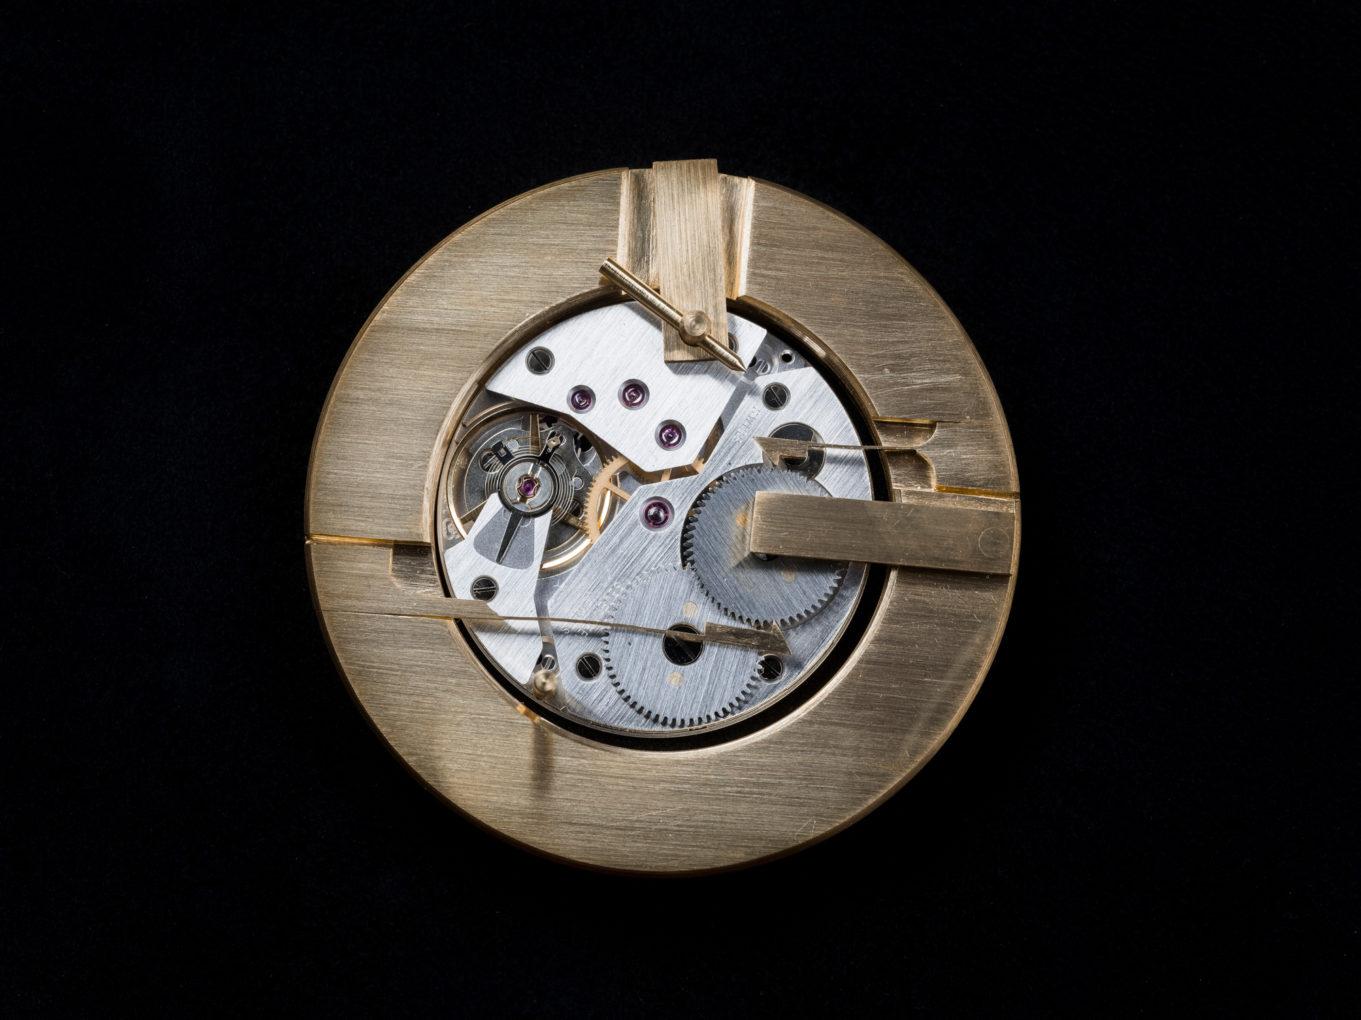 5-17_Watches_Cartier_3eme-Prix